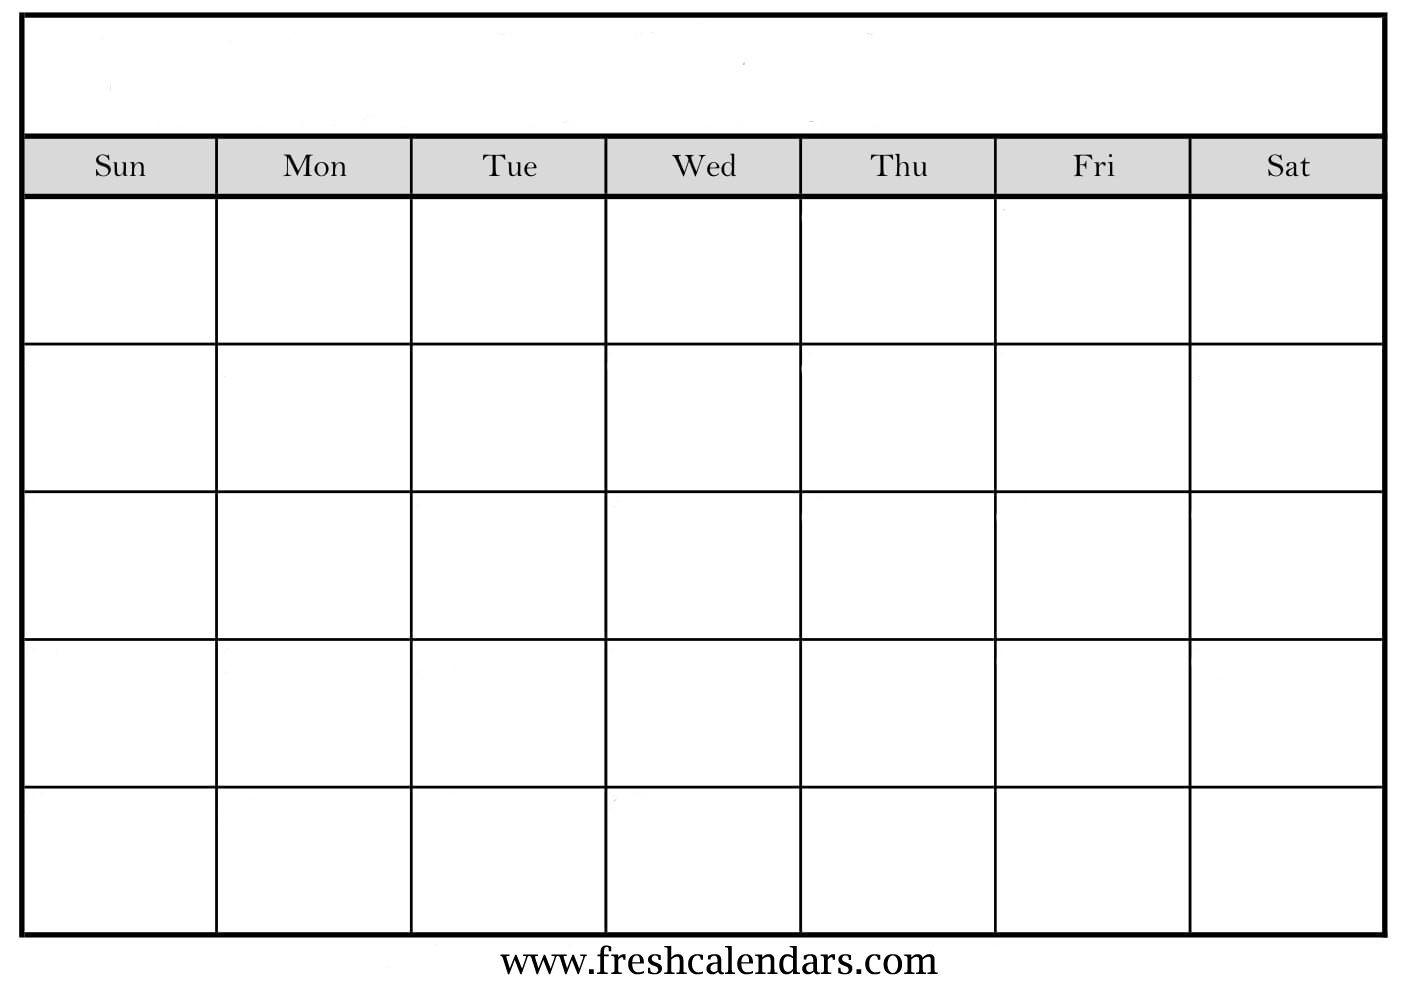 Free Printable Schedule Calendar Blank Calendar Wonderfully Printable 2019 Templates